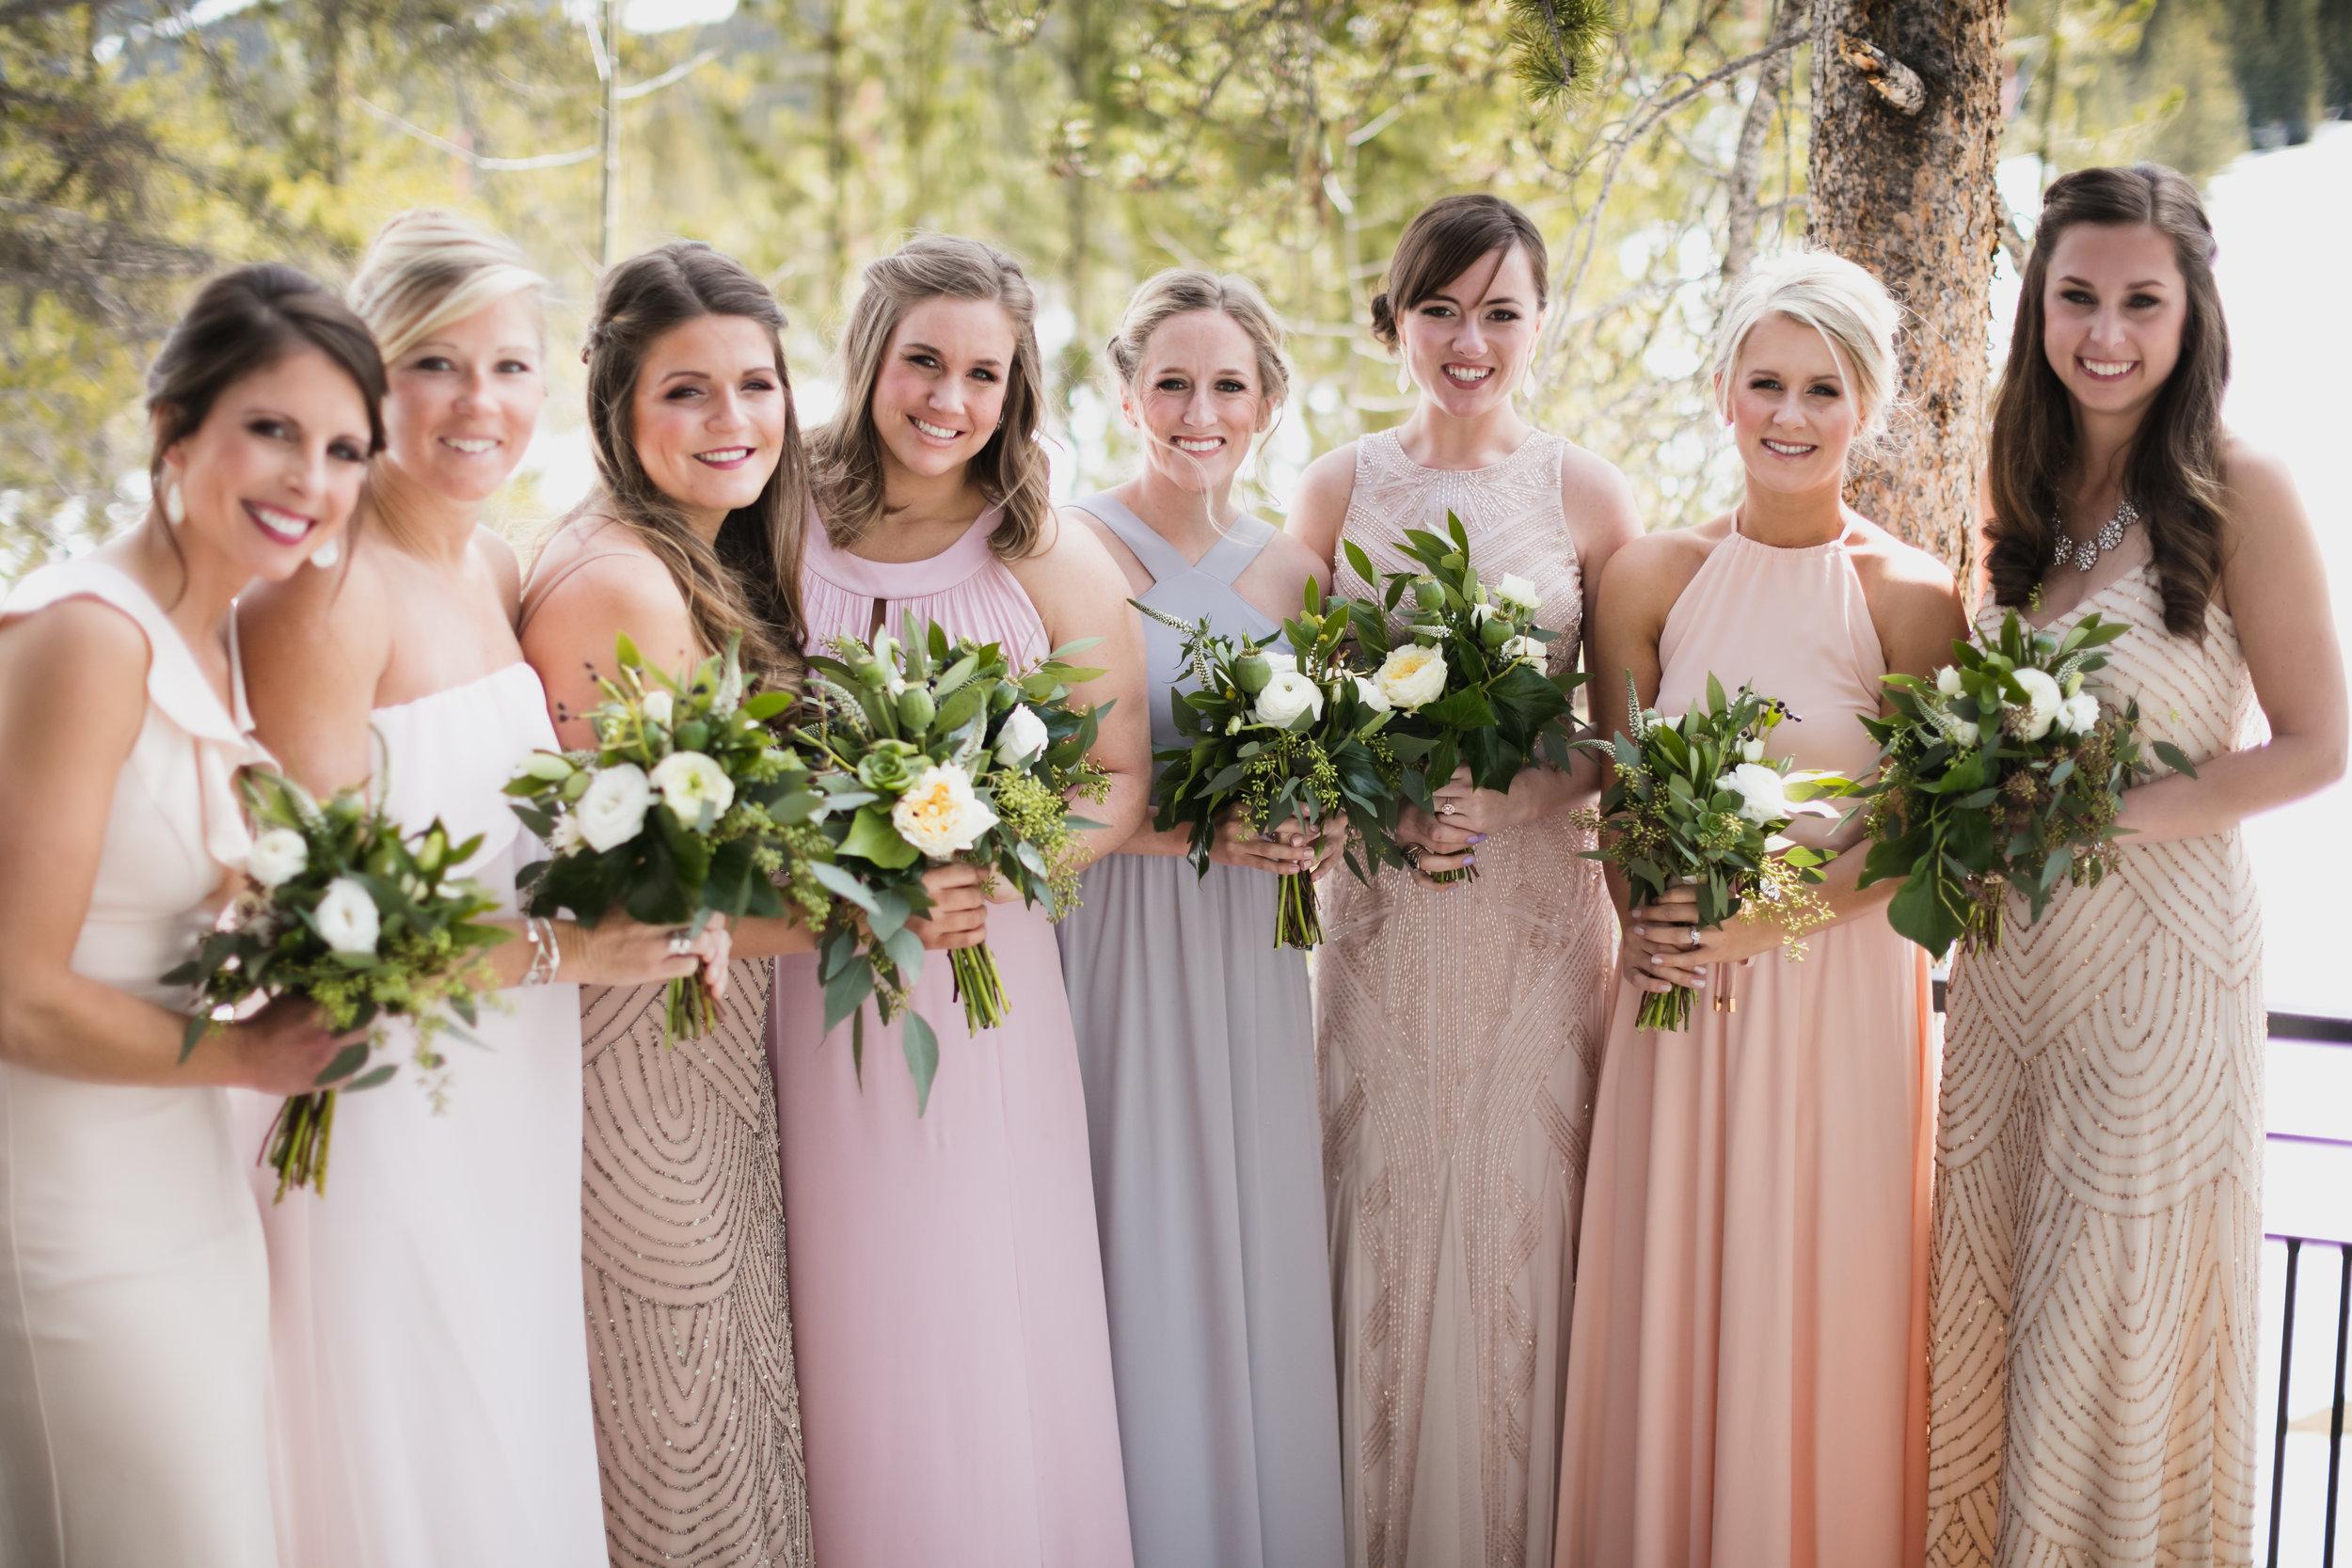 vild-photography-photographer-colorado-intimate-wedding-adventure-Stephanie- Adam-157.jpg